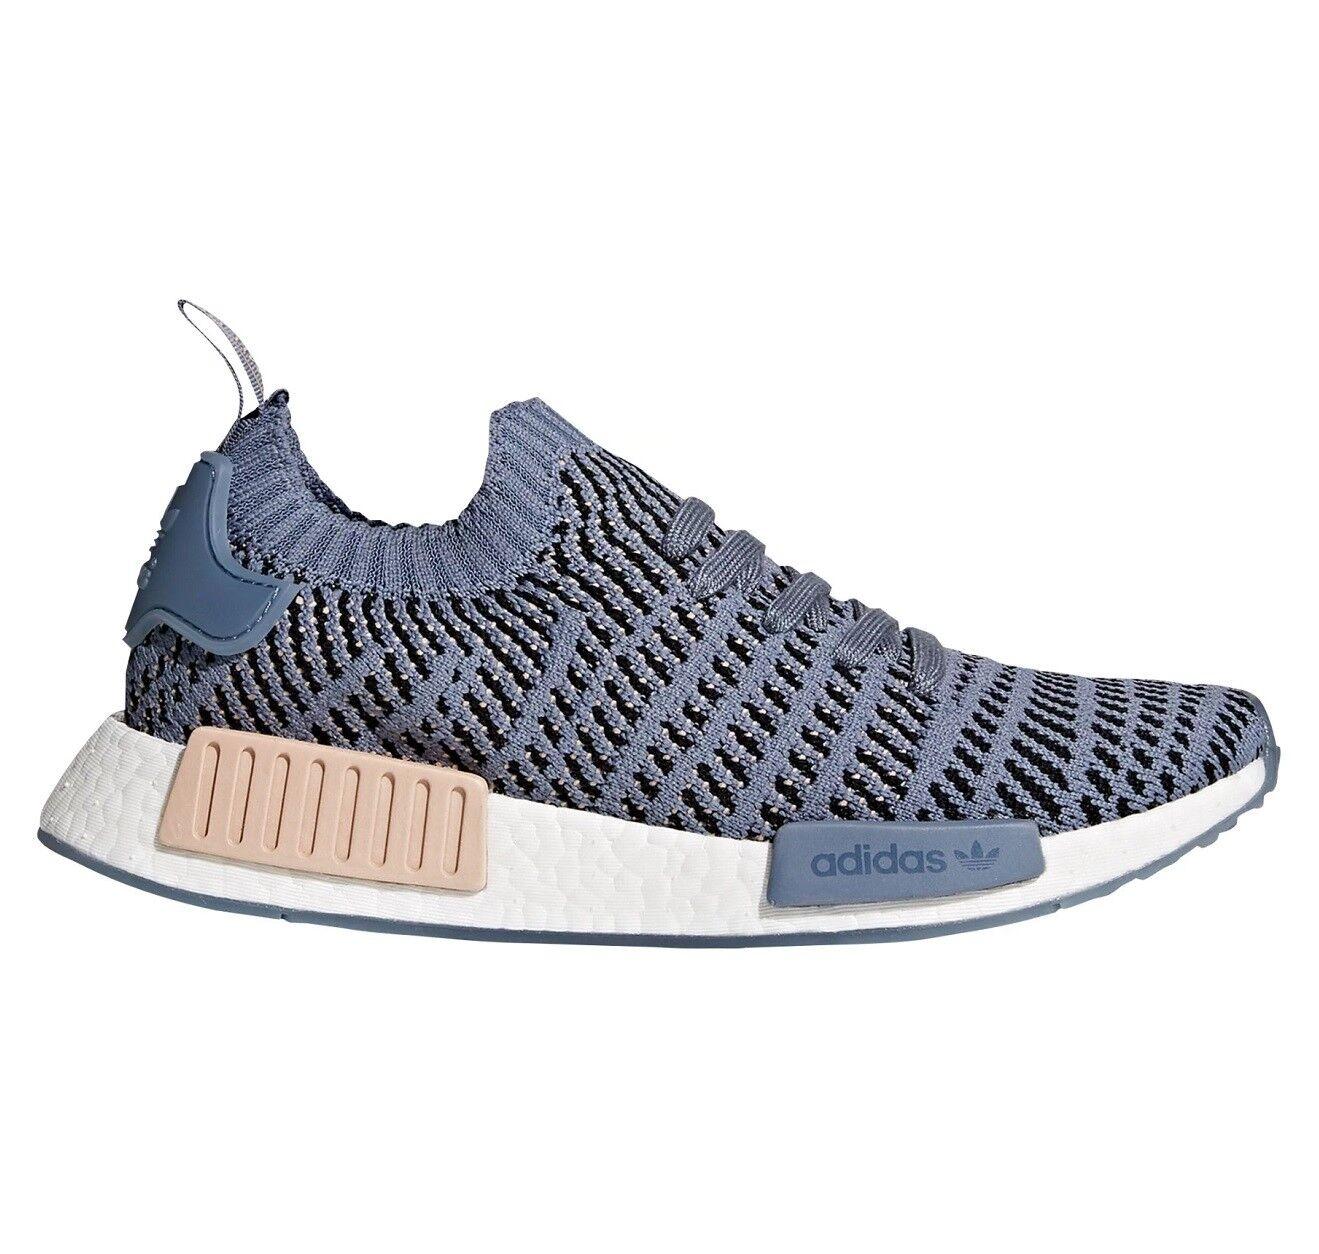 Adidas NMD R1 Stlt Primeknit Womens CQ2029 Steel Pearl Running shoes Size 5